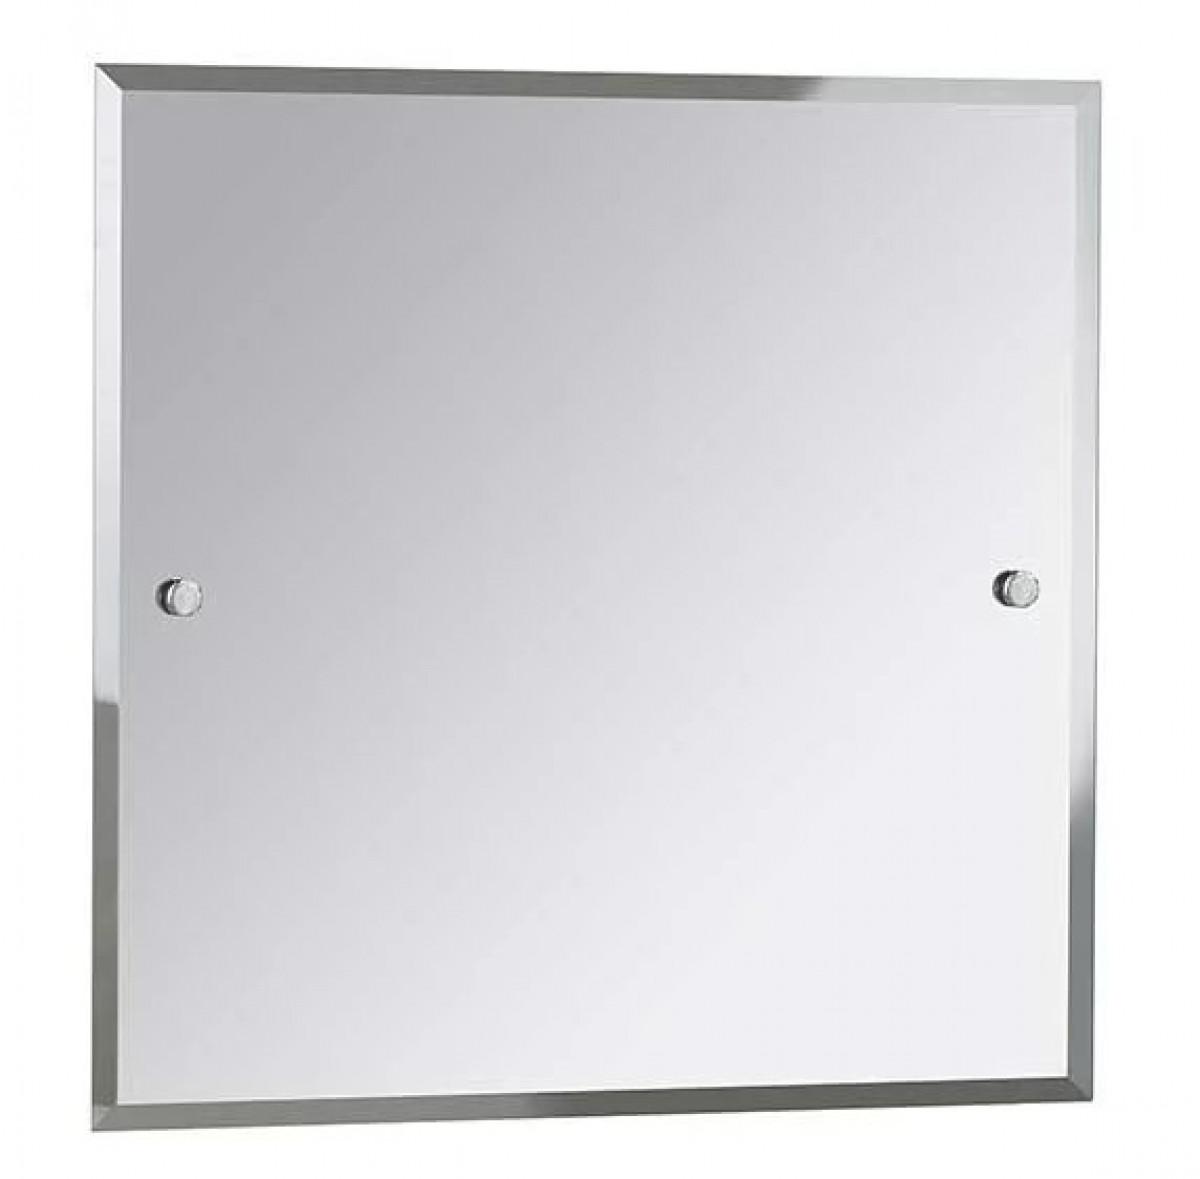 Bristan square bathroom mirror 600mm x 600mm chrome for Mirror 600 x 600